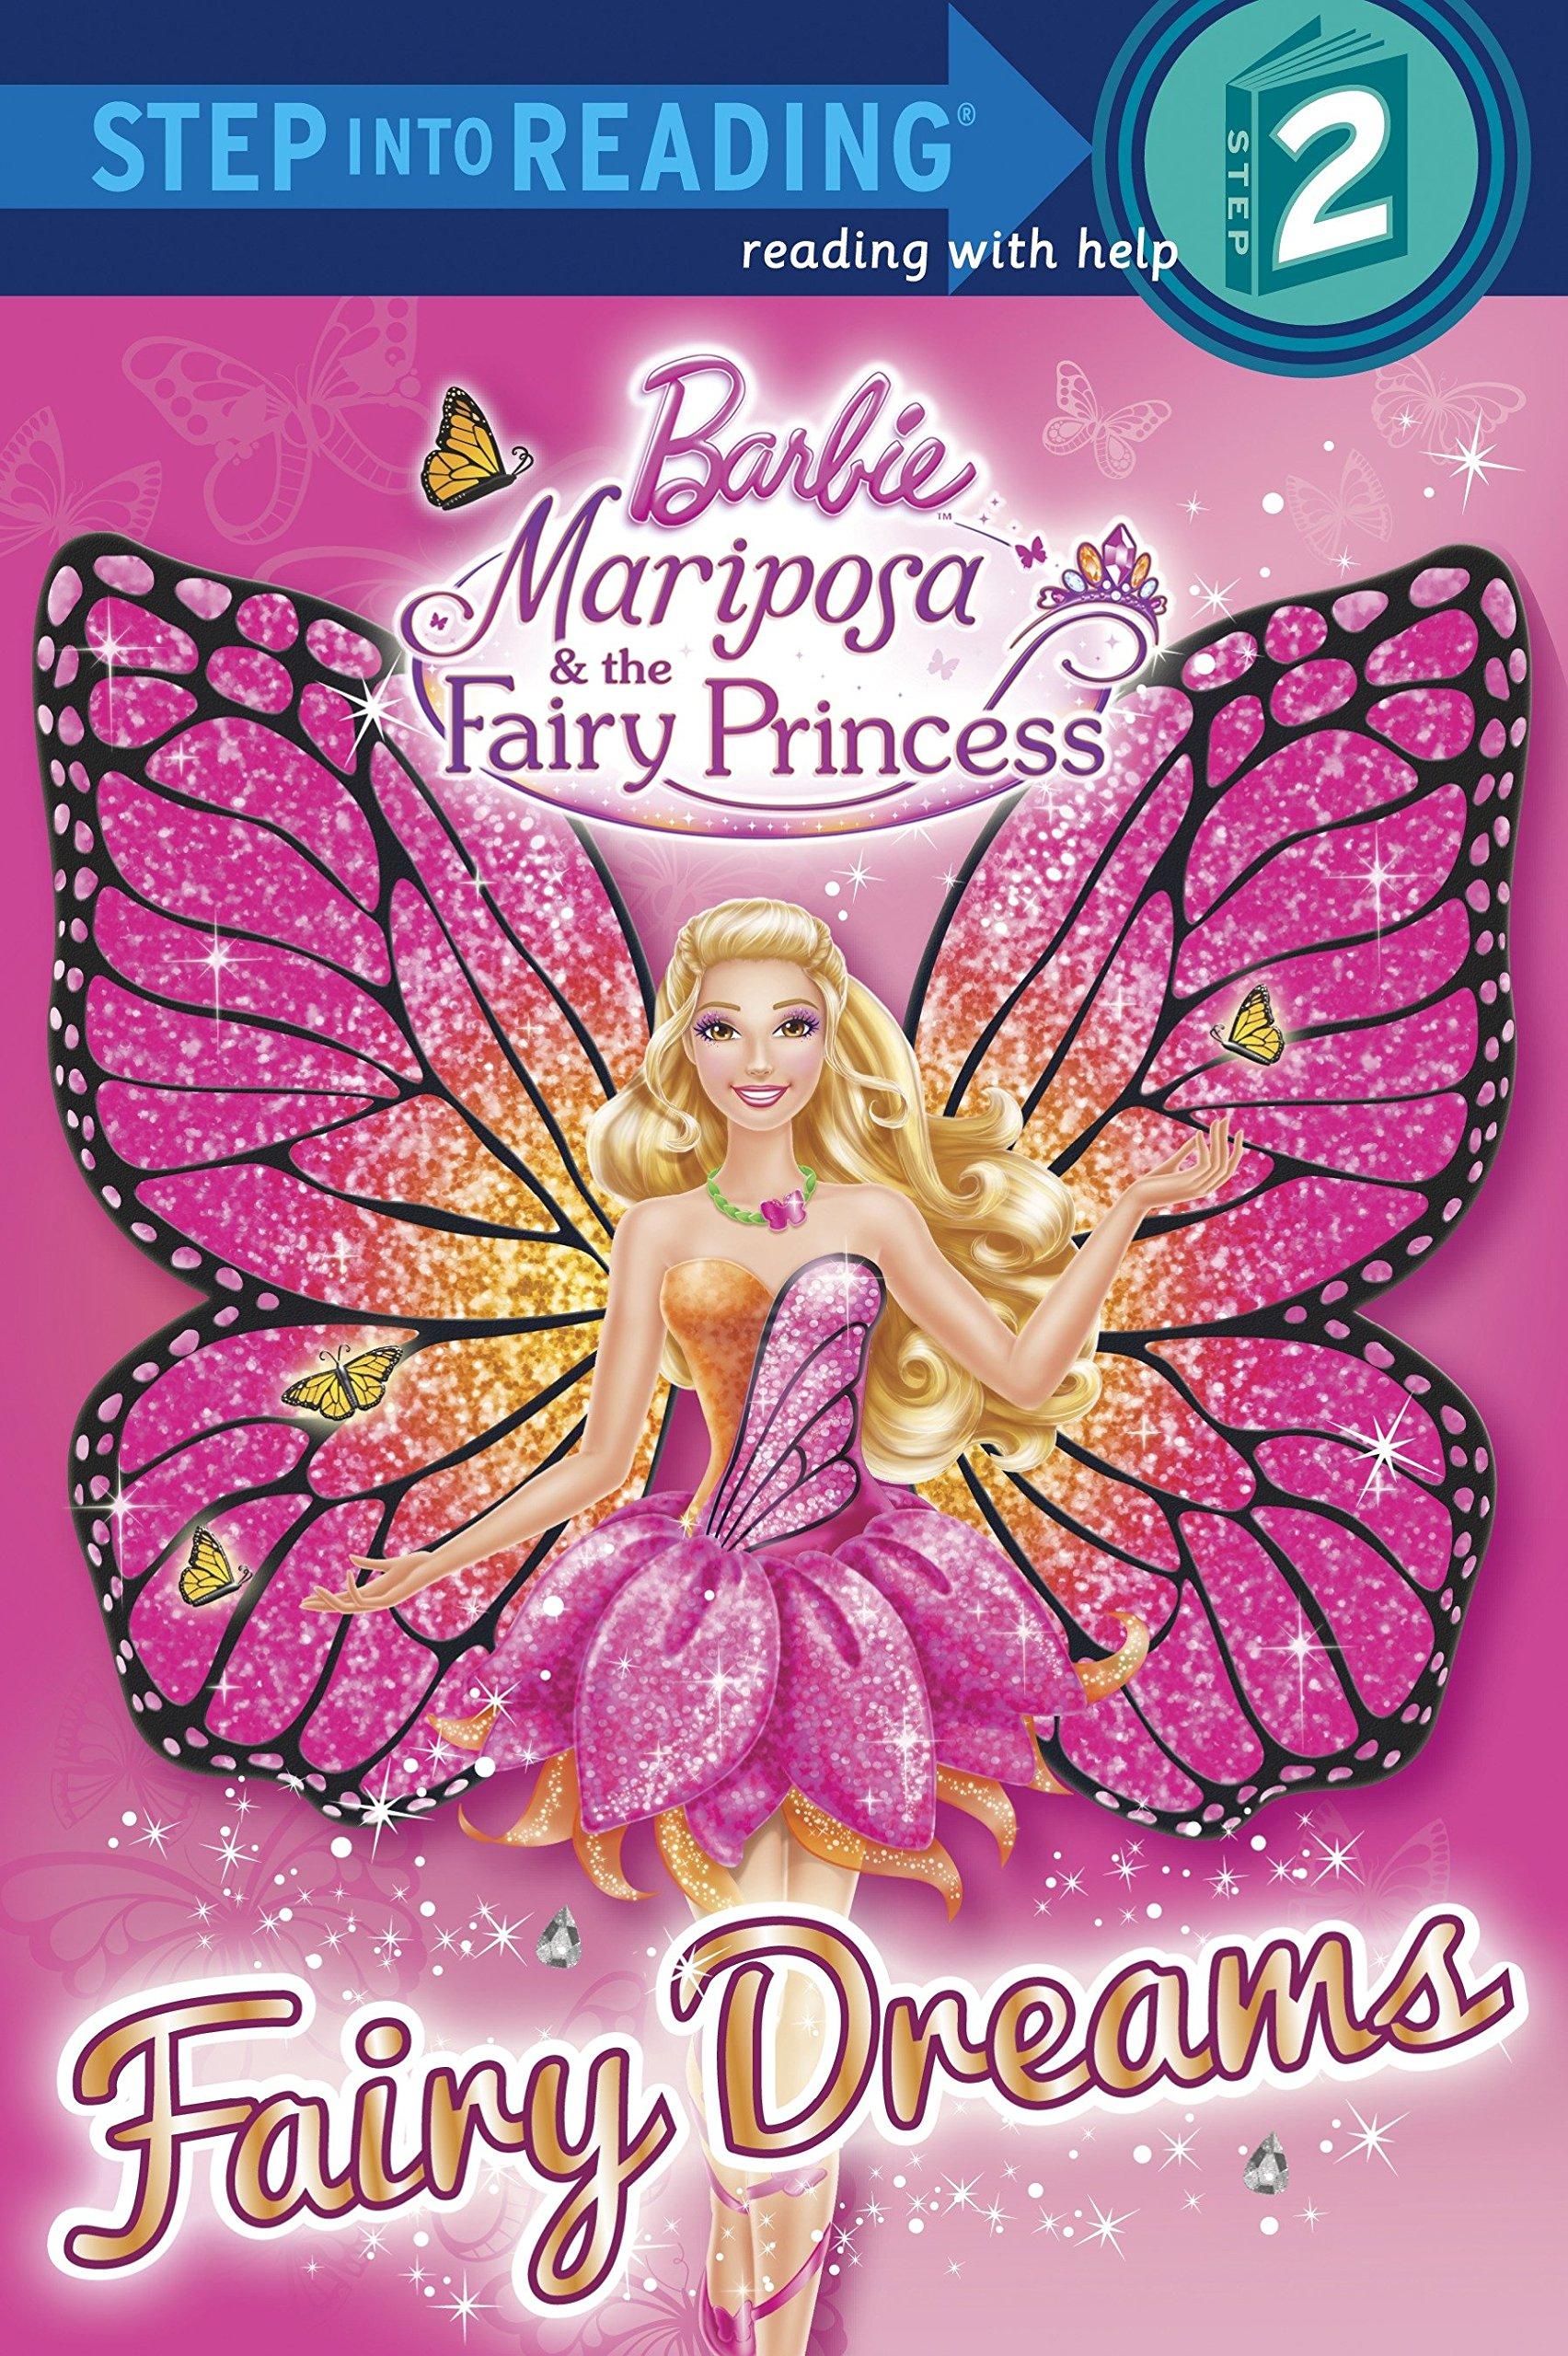 Amazon.com: Fairy Dreams (Barbie) (Step into Reading) (9780449816288): Mary  Man-Kong, Random House: Books